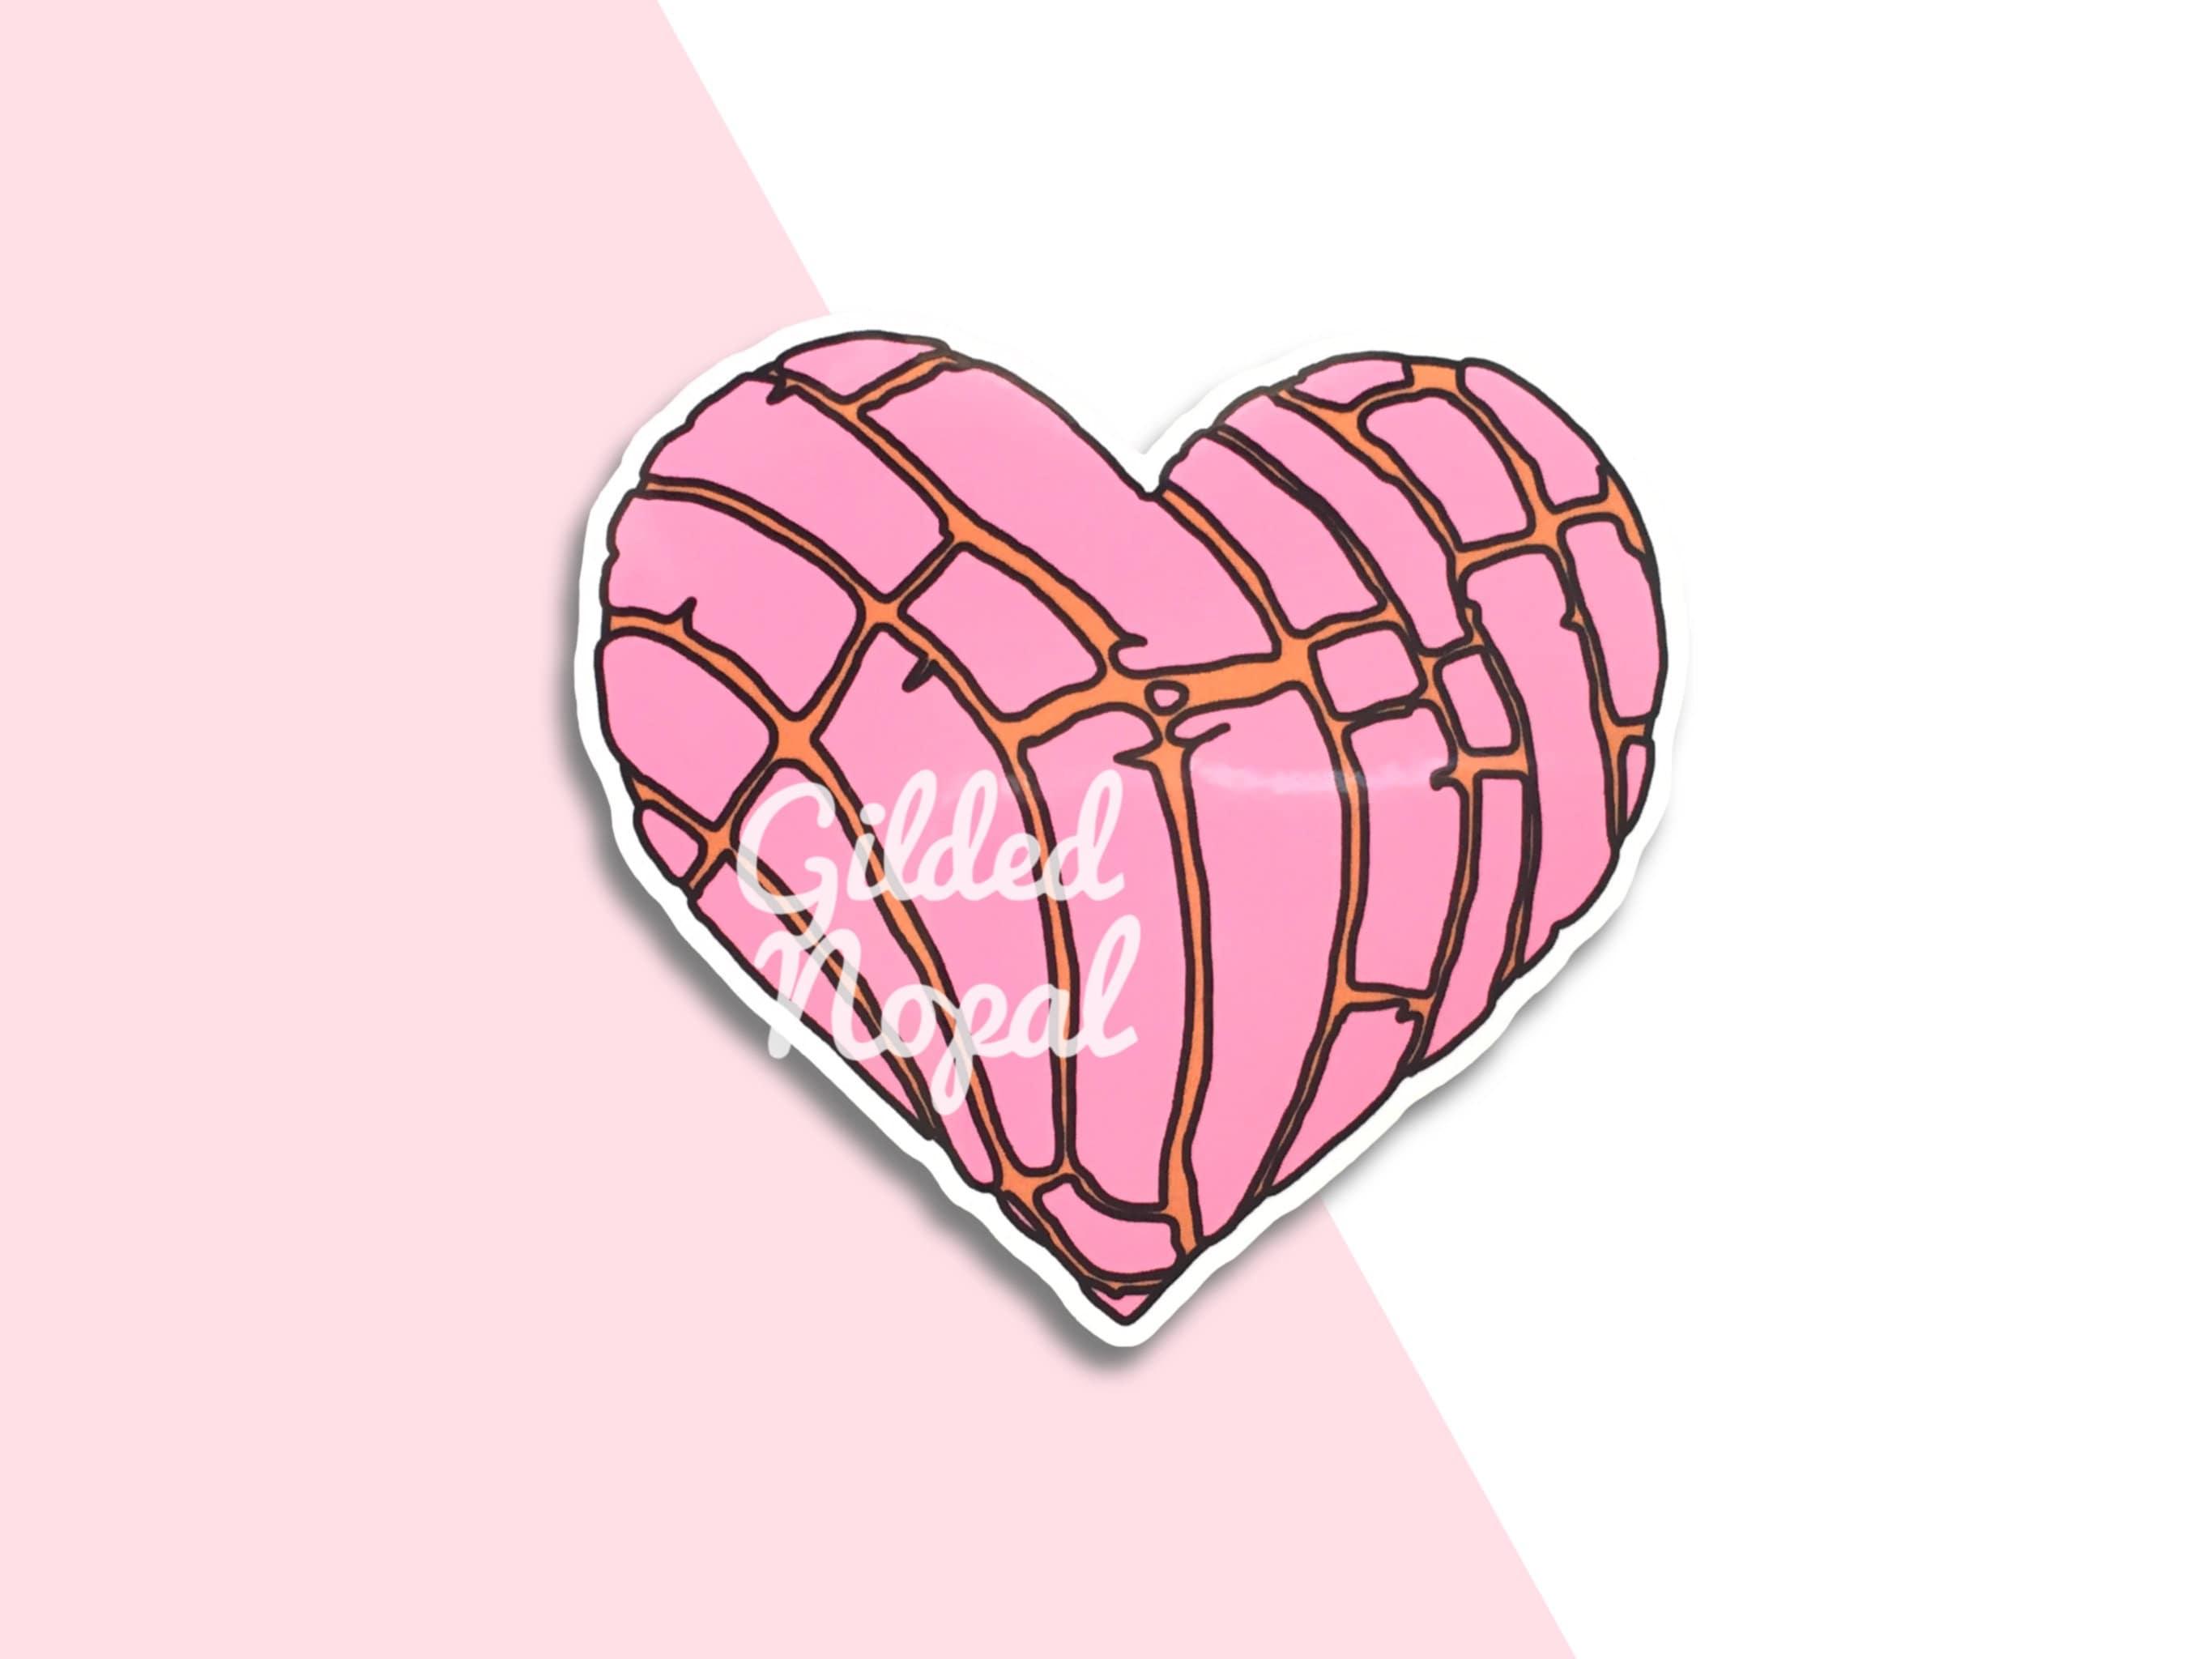 Concha Heart Sticker Pan Dulce Pink Concha Etsy